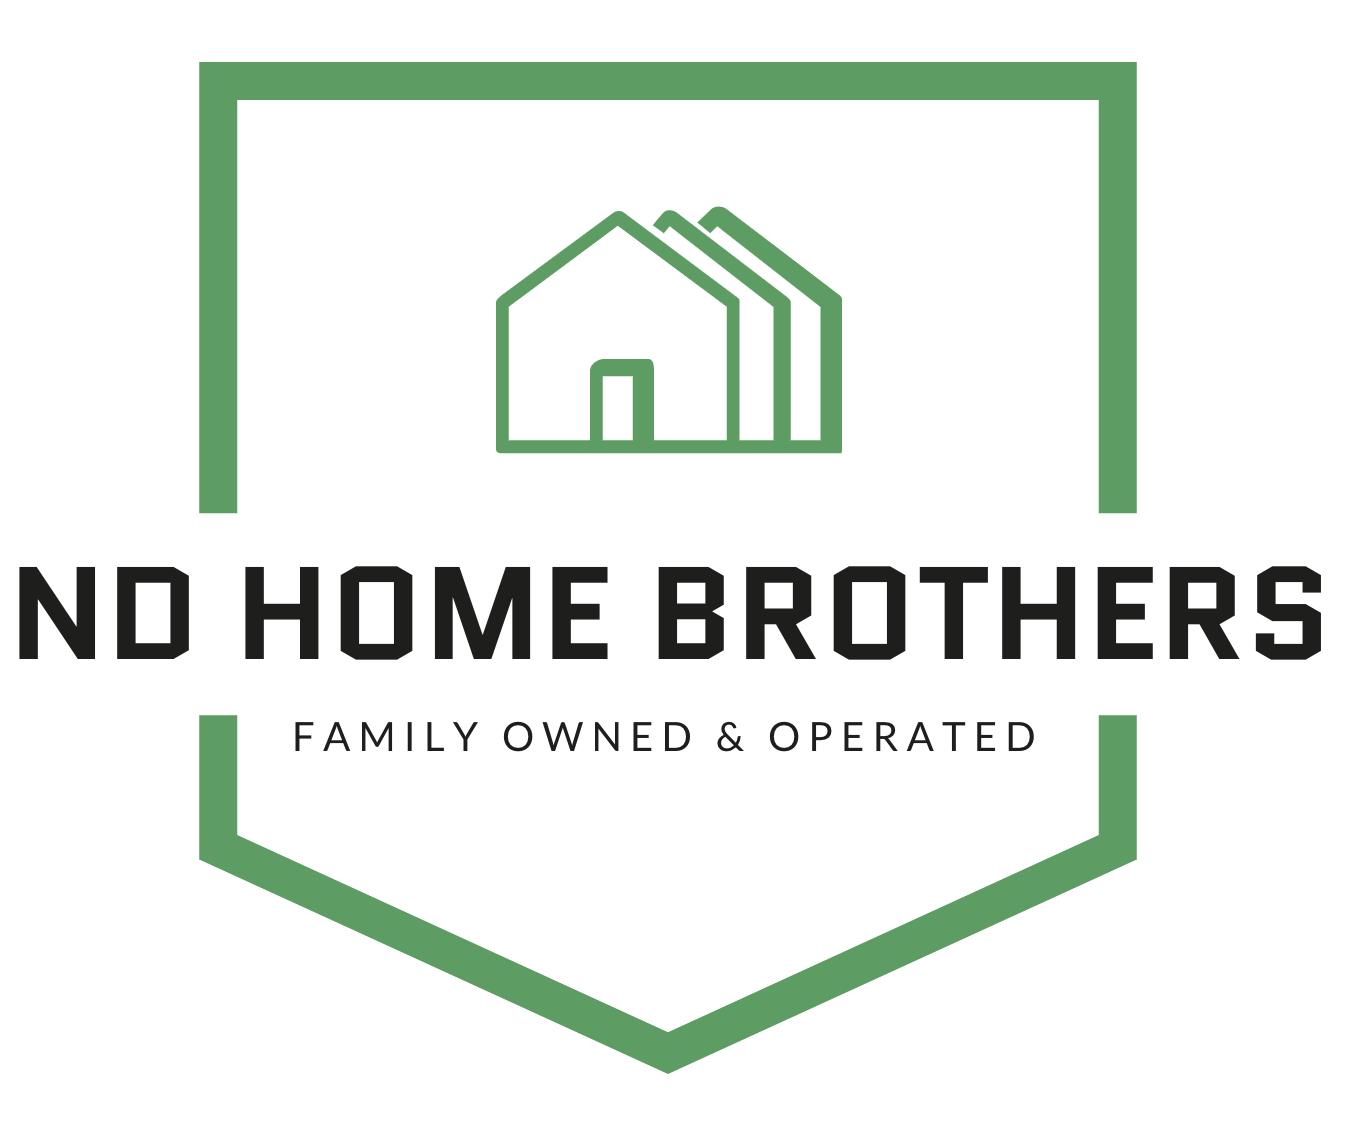 North Dakota Home Brothers logo